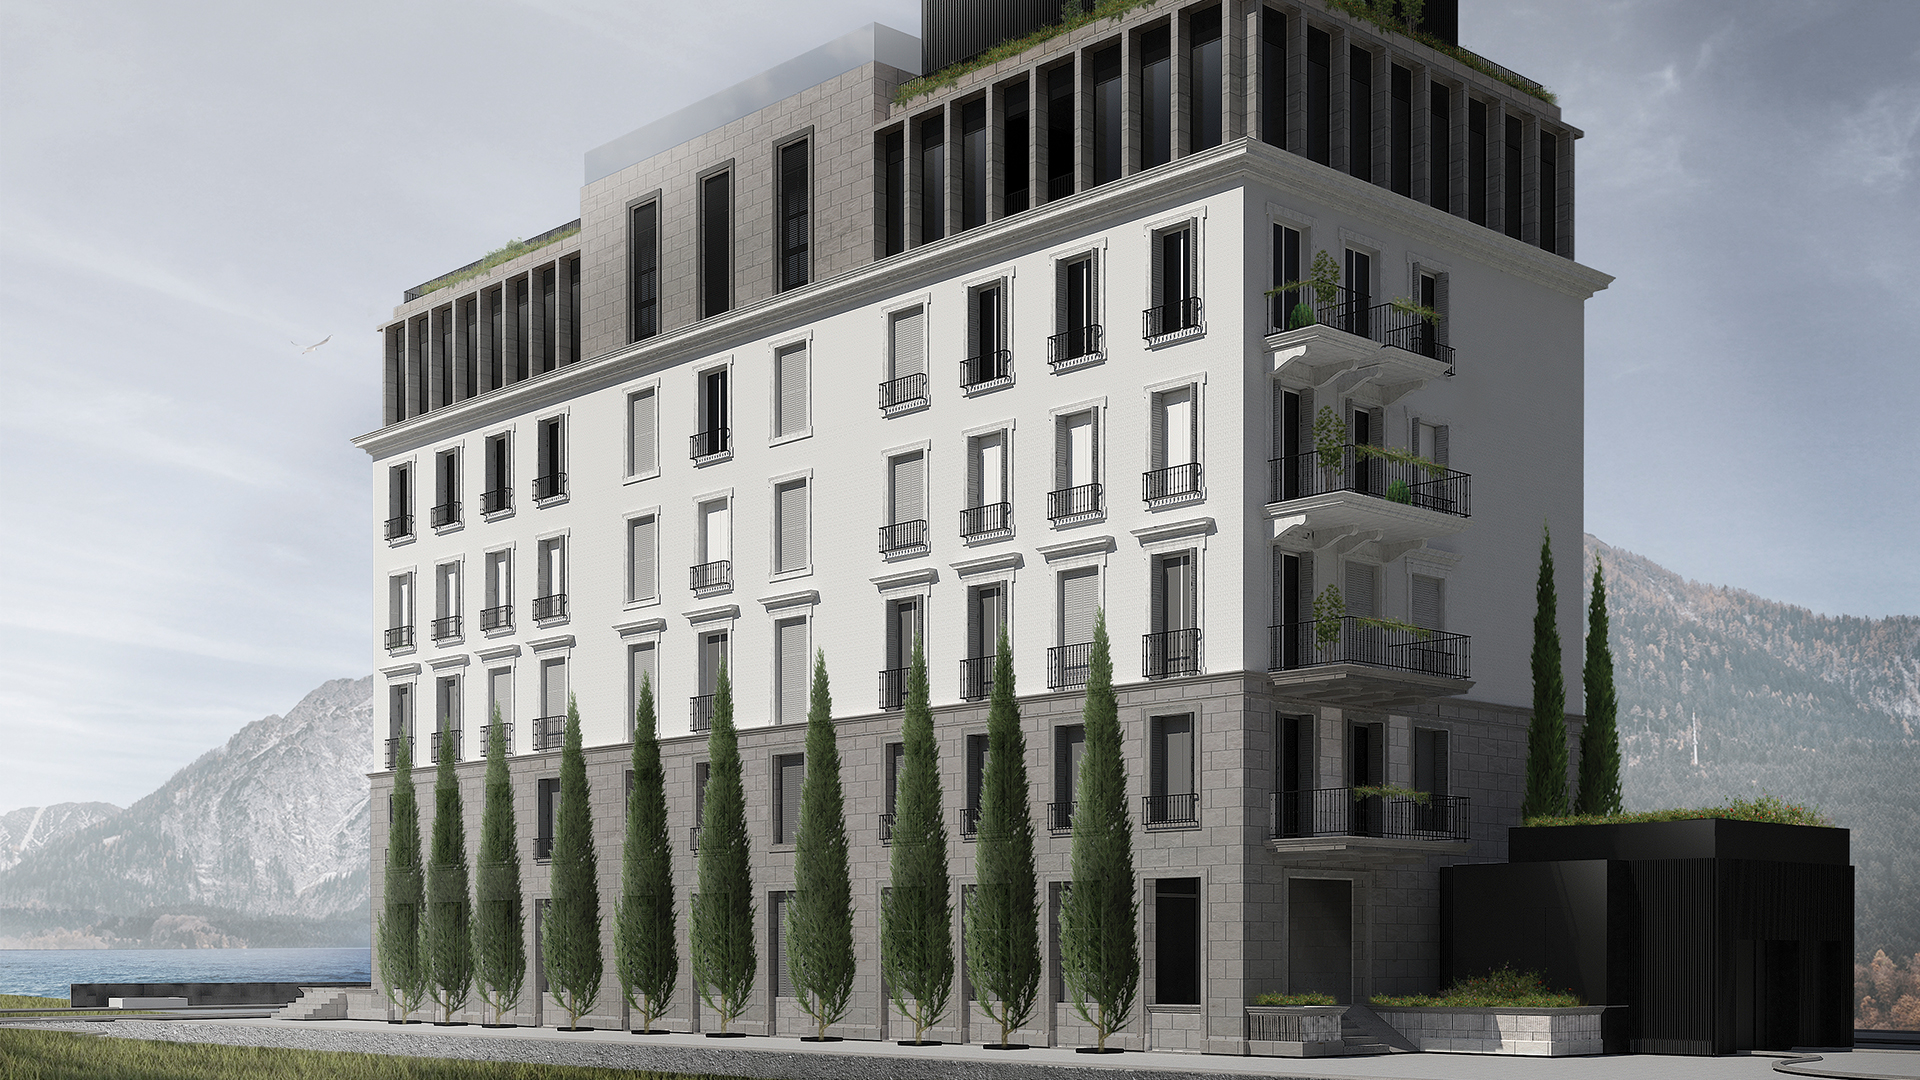 https://generalinvest.me/upl/2020/08/Porto_Palace_2.jpg